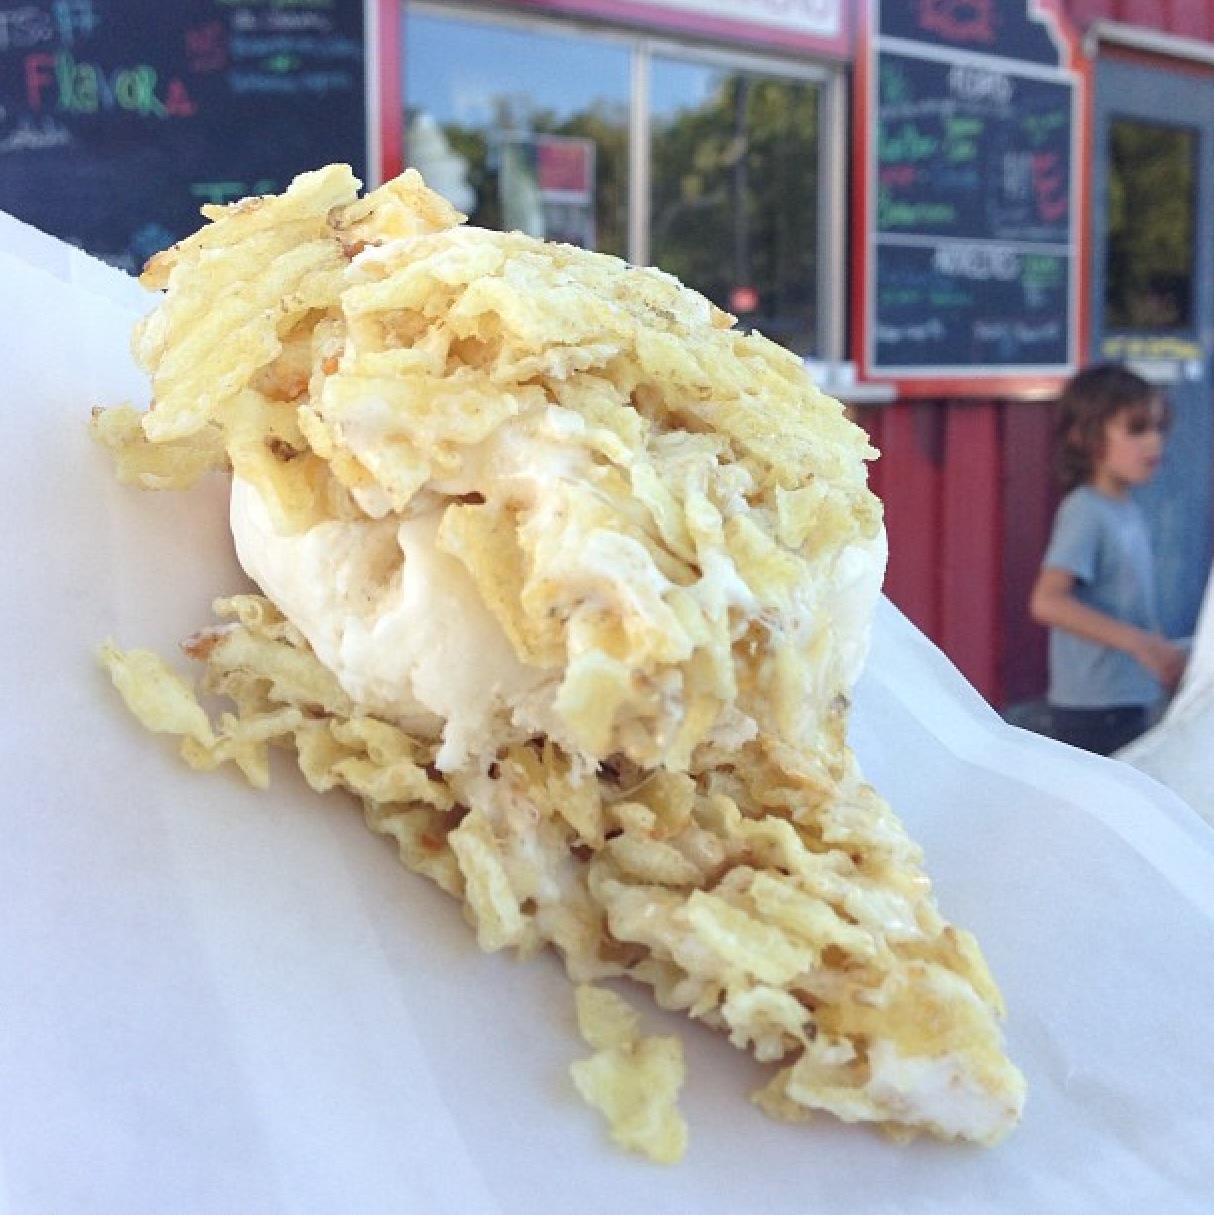 Potato chip rice-crispy treat ice cream sandwich with made-onspot vanilla ice cream from Carnival Barker's!